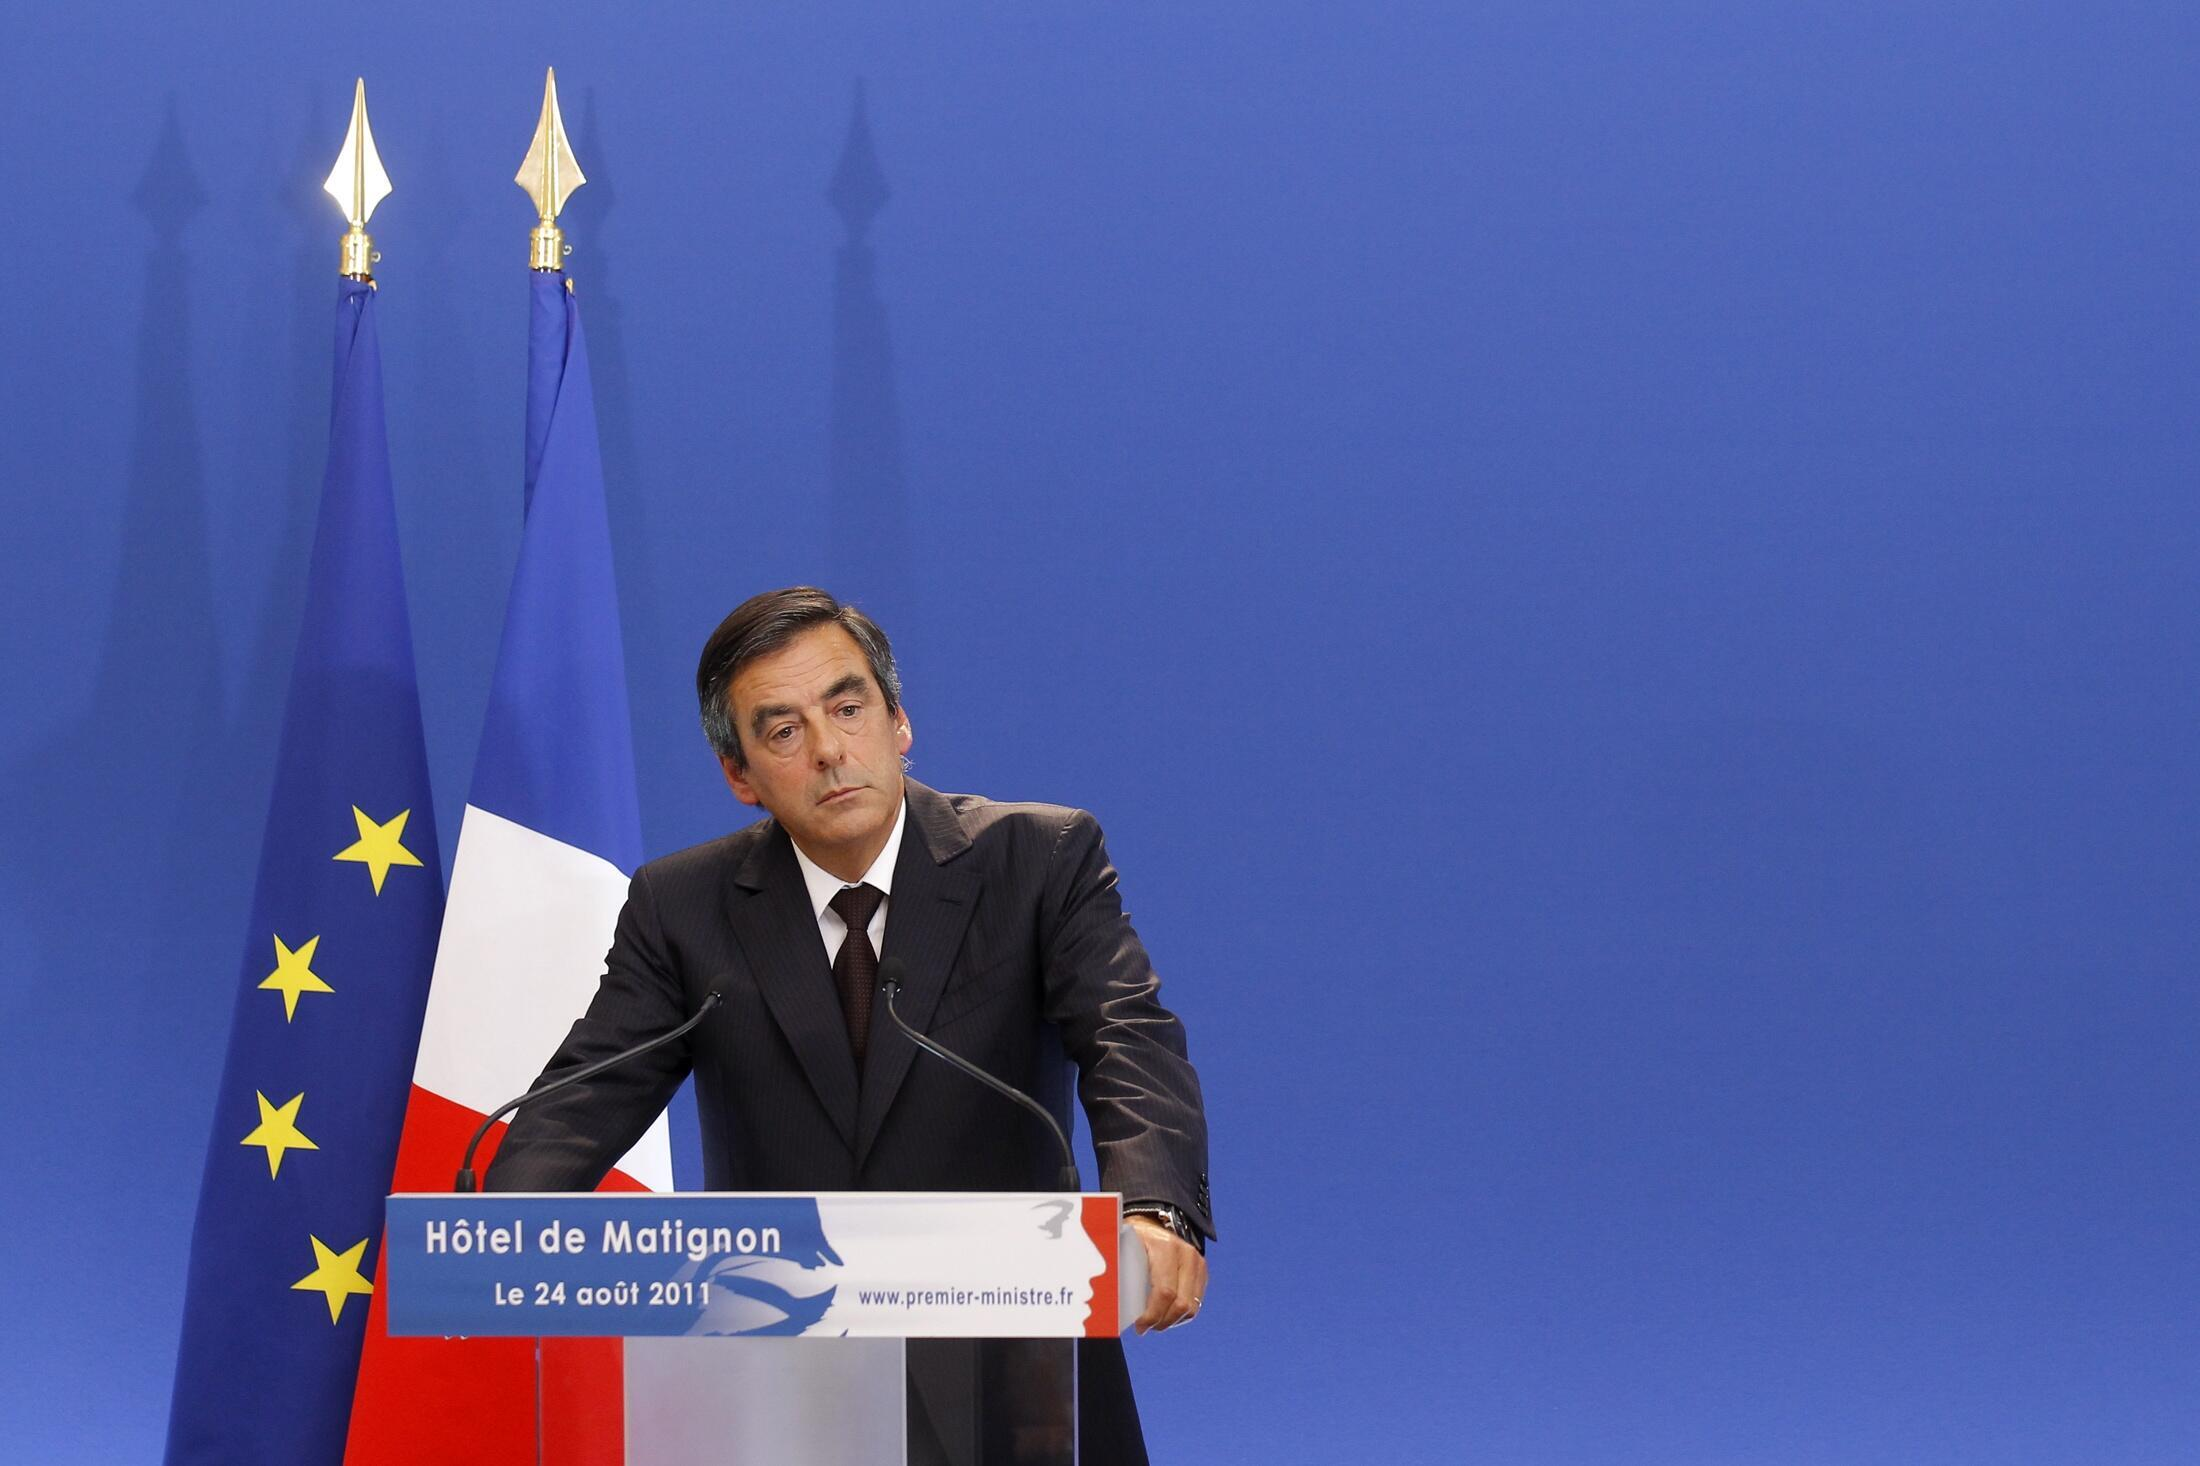 François Fillon anuncia plano de austeridade para economizar 12 bilhões de euros do déficit público.